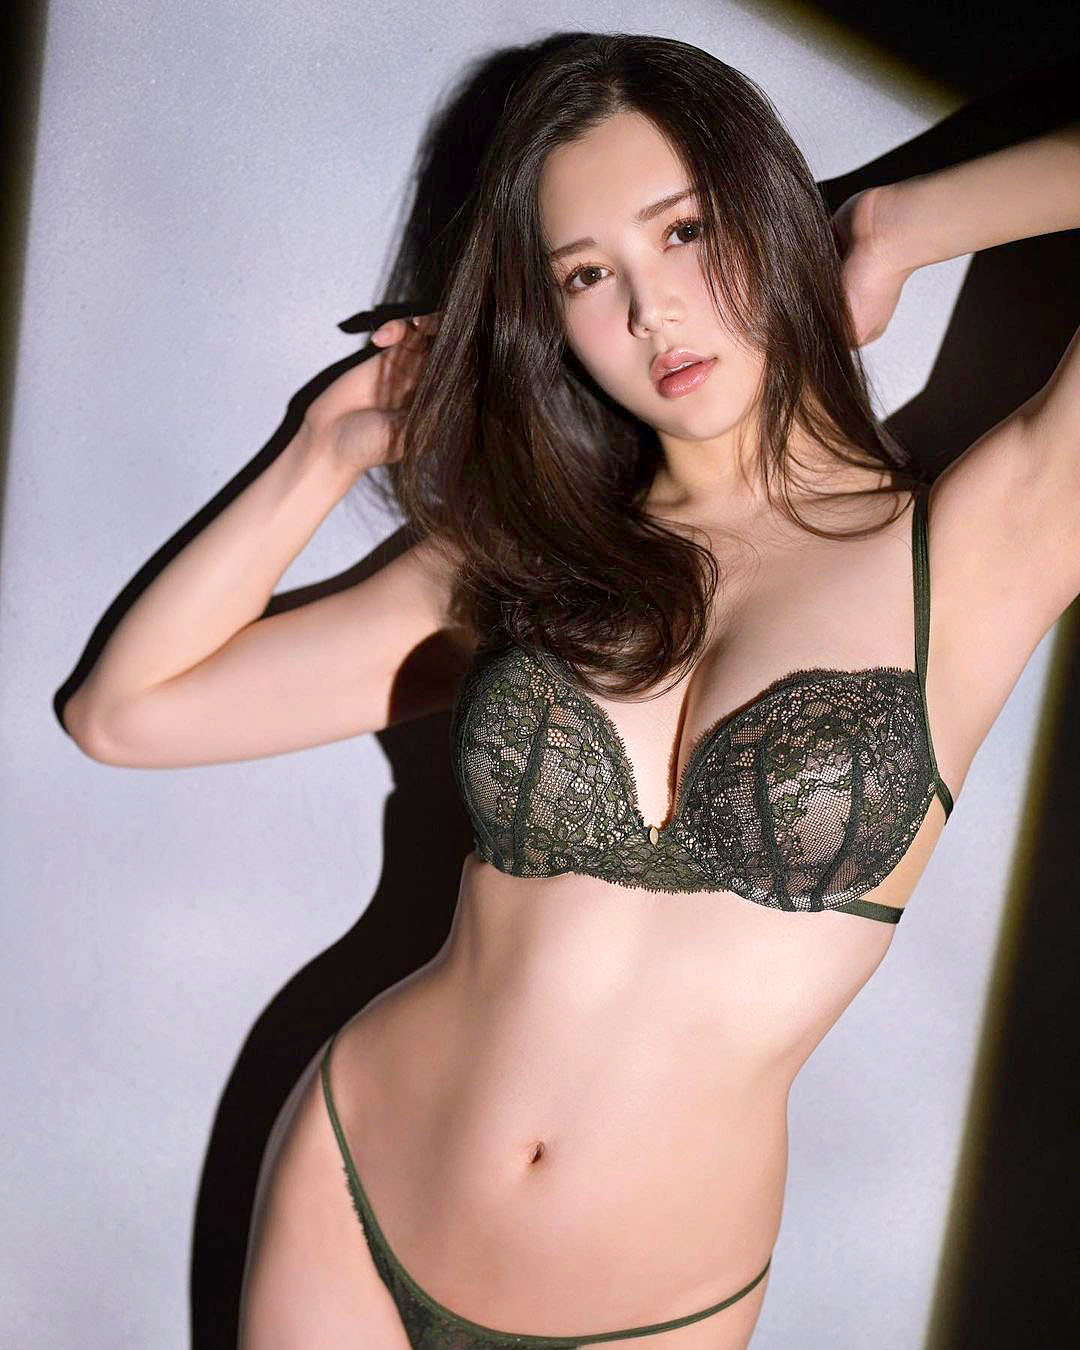 Miu Shiramine 2103 21.jpg